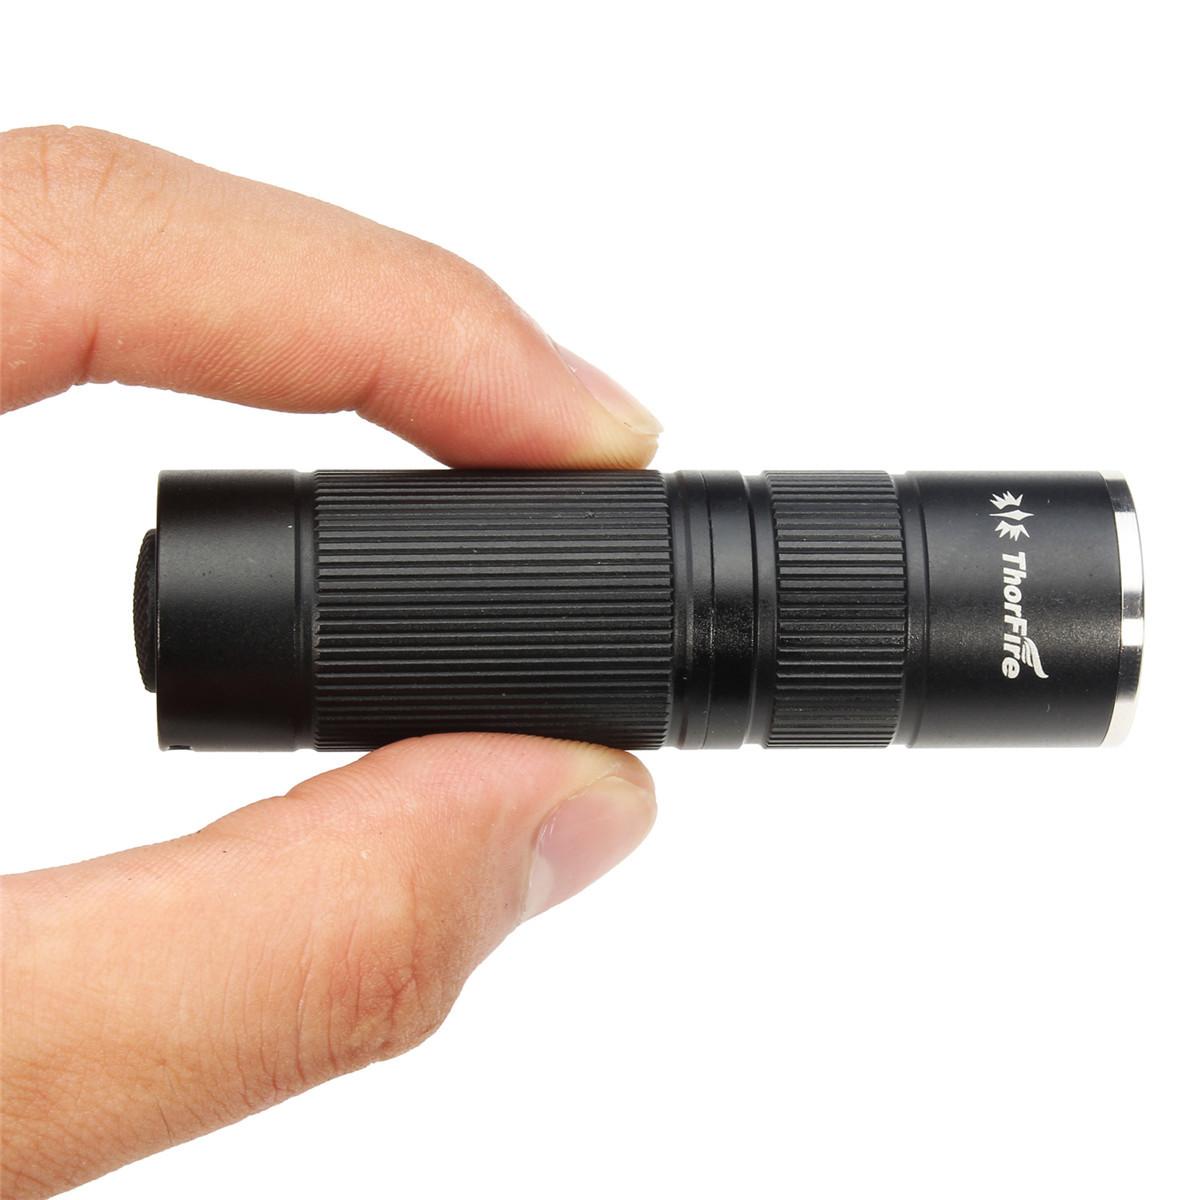 ThorFire KL03 Ultra Bright Mini Keychain LED Flashlight 174Lumen for Pocket Torc